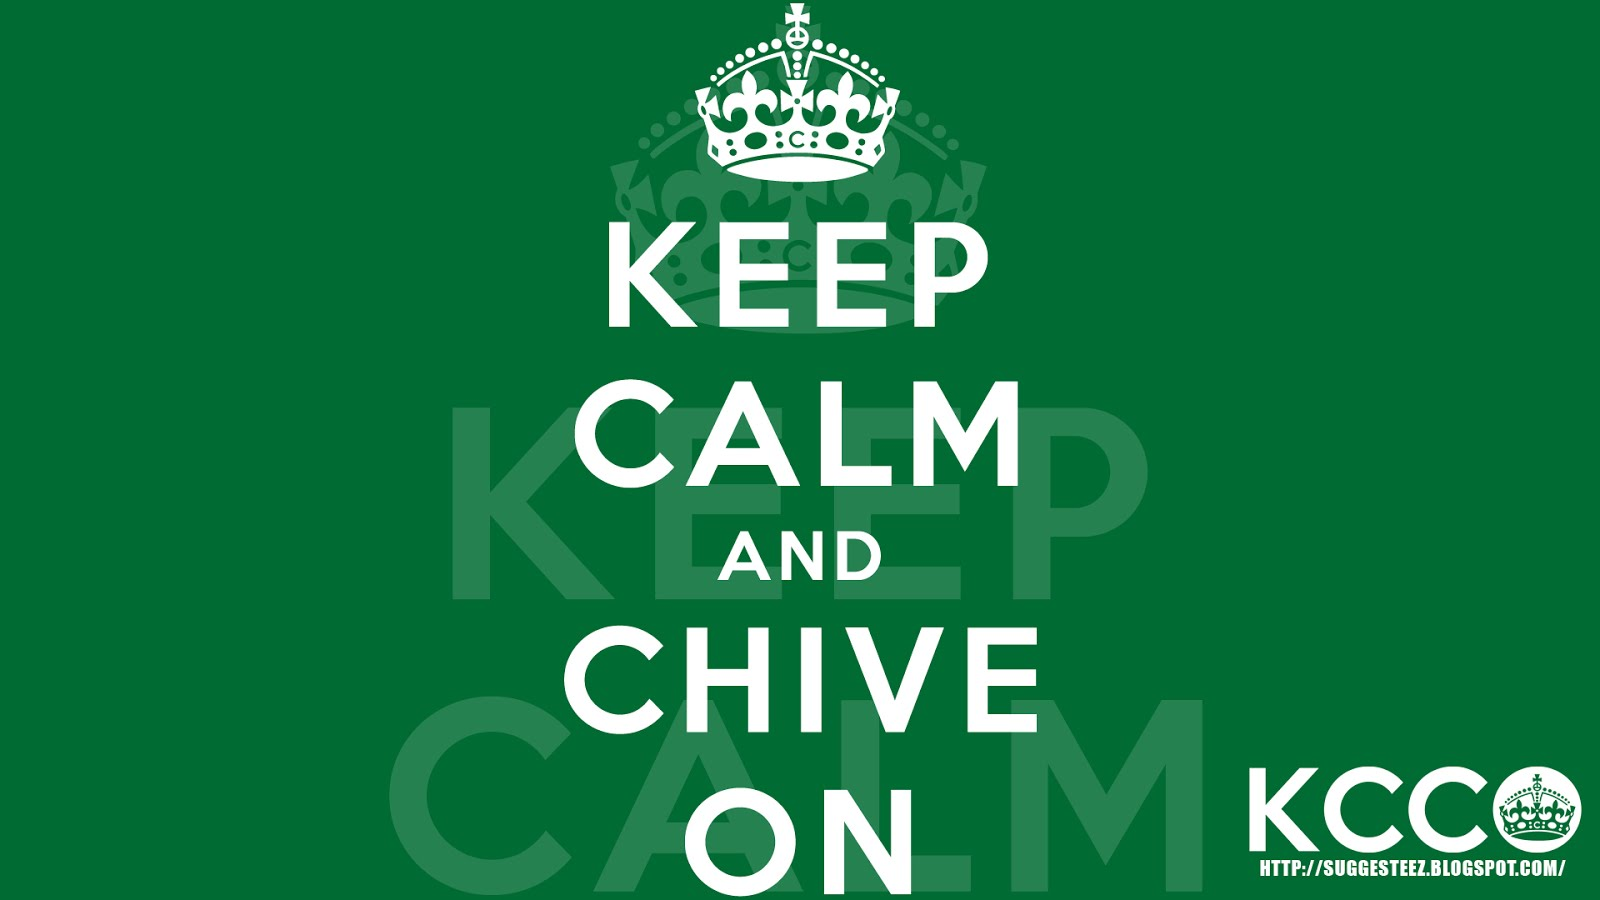 http://4.bp.blogspot.com/-EAH3DNsANF8/UIHXTgGOeYI/AAAAAAAAADQ/fjH5vQqWBFc/s1600/KCCO+Keep+Calm+and+Chive+On+Classic+HD+Wallpaper.jpg